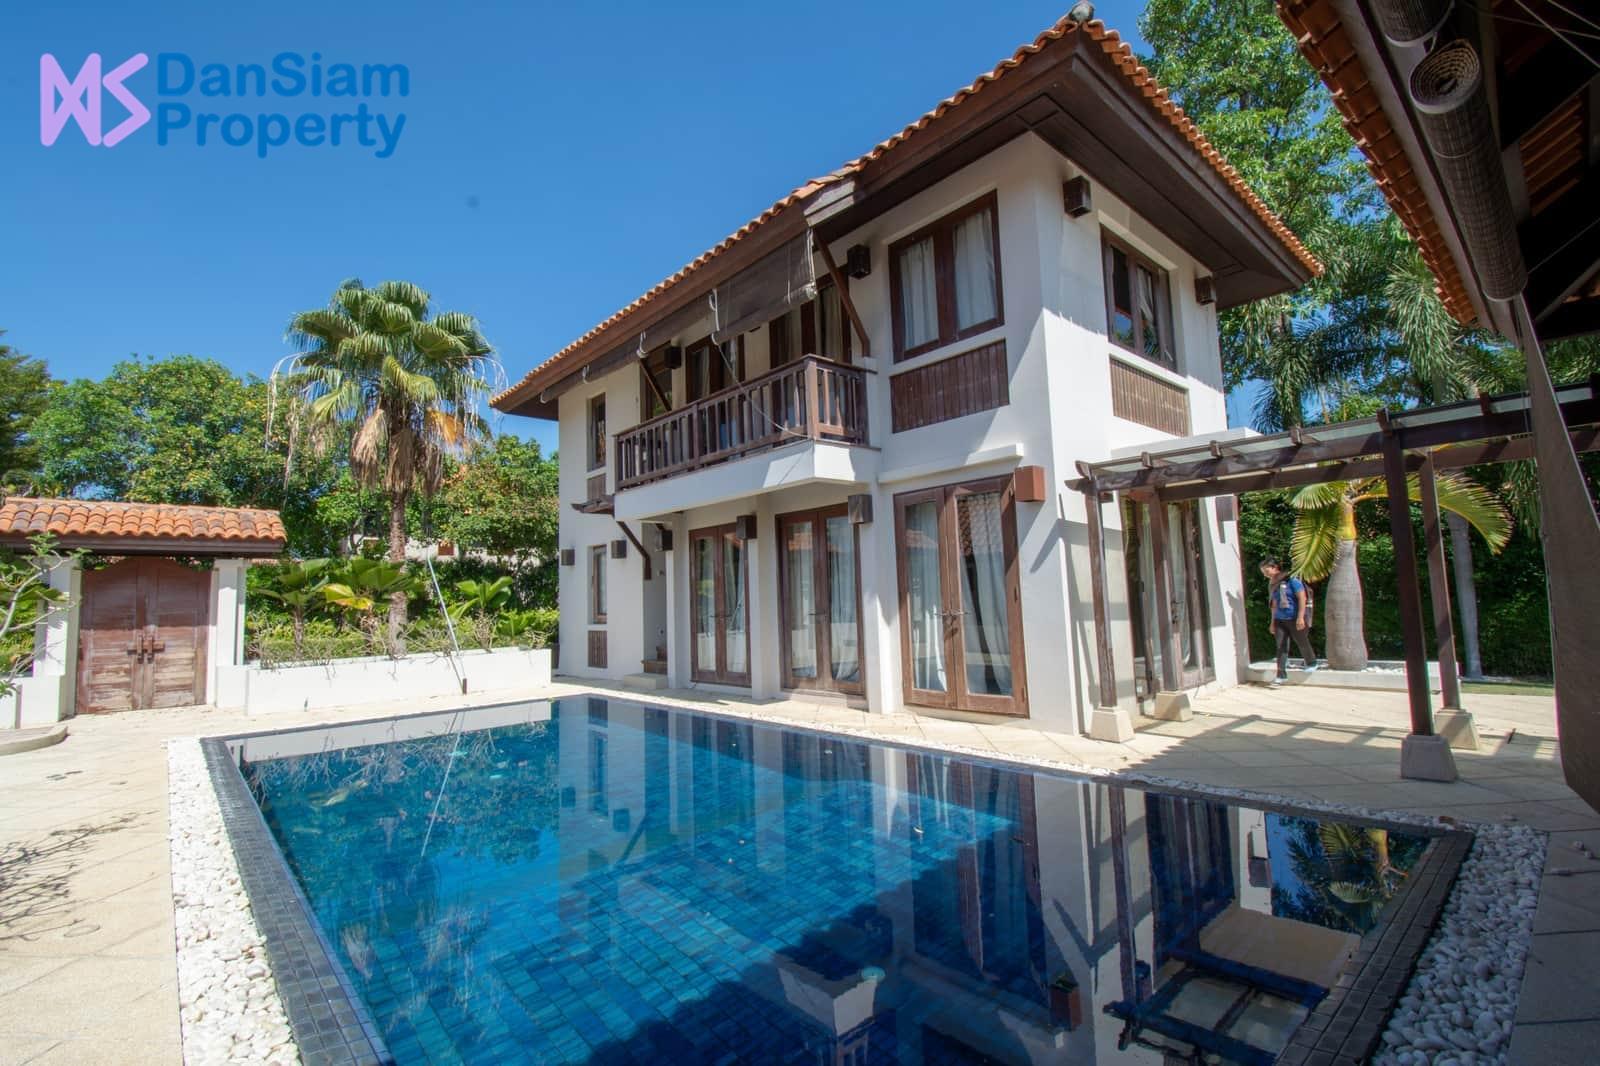 Bali-style Pool Villa in Hua Hin at Palm Hills Golf Resort